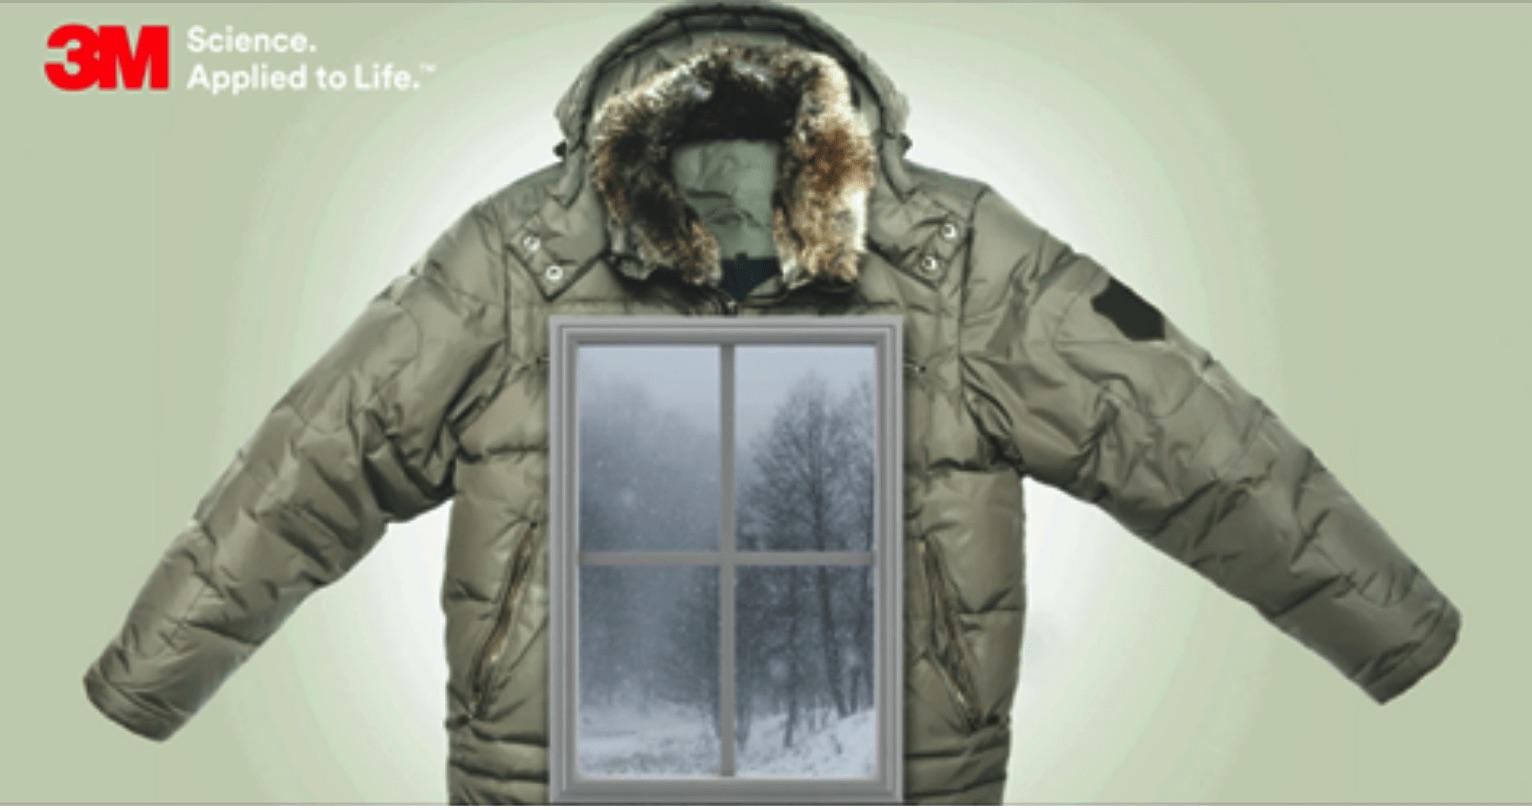 3M Insulating Window Film – A Winter Jacket for Inefficient Windows